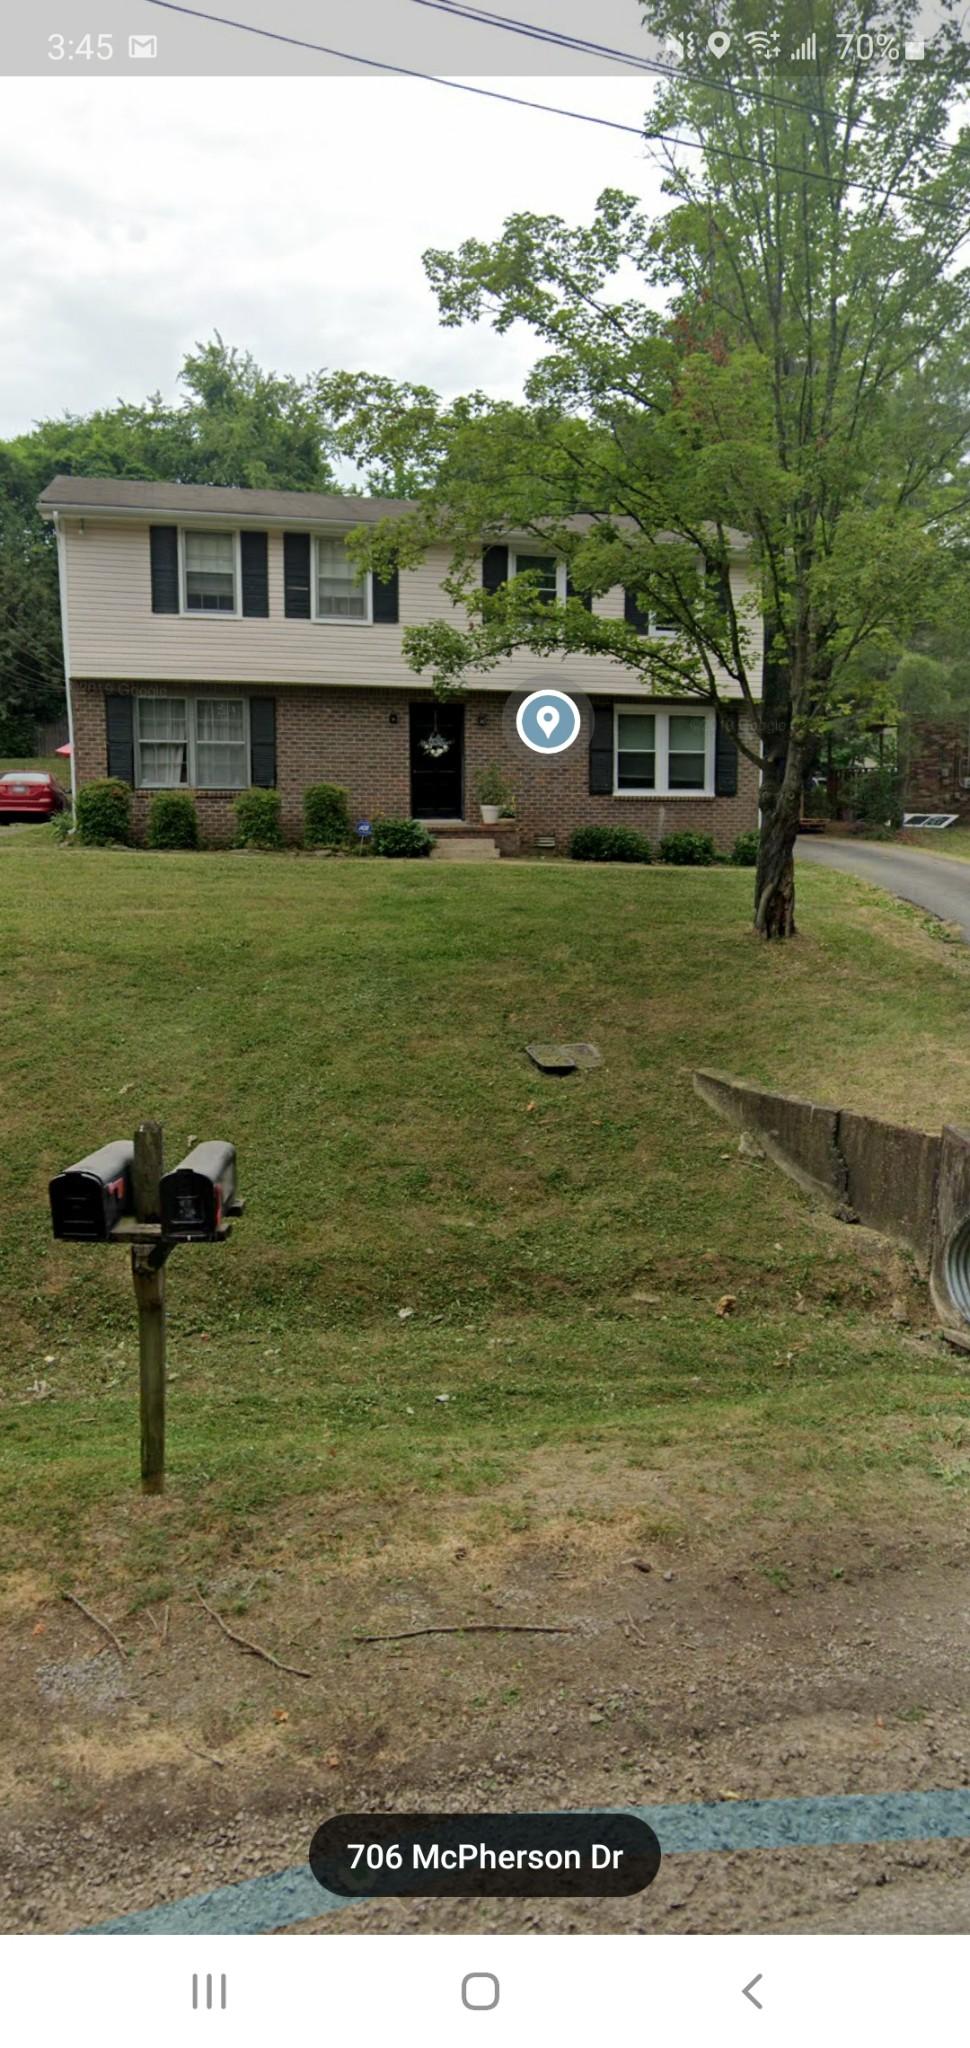 741 McPherson Dr Property Photo - Nashville, TN real estate listing